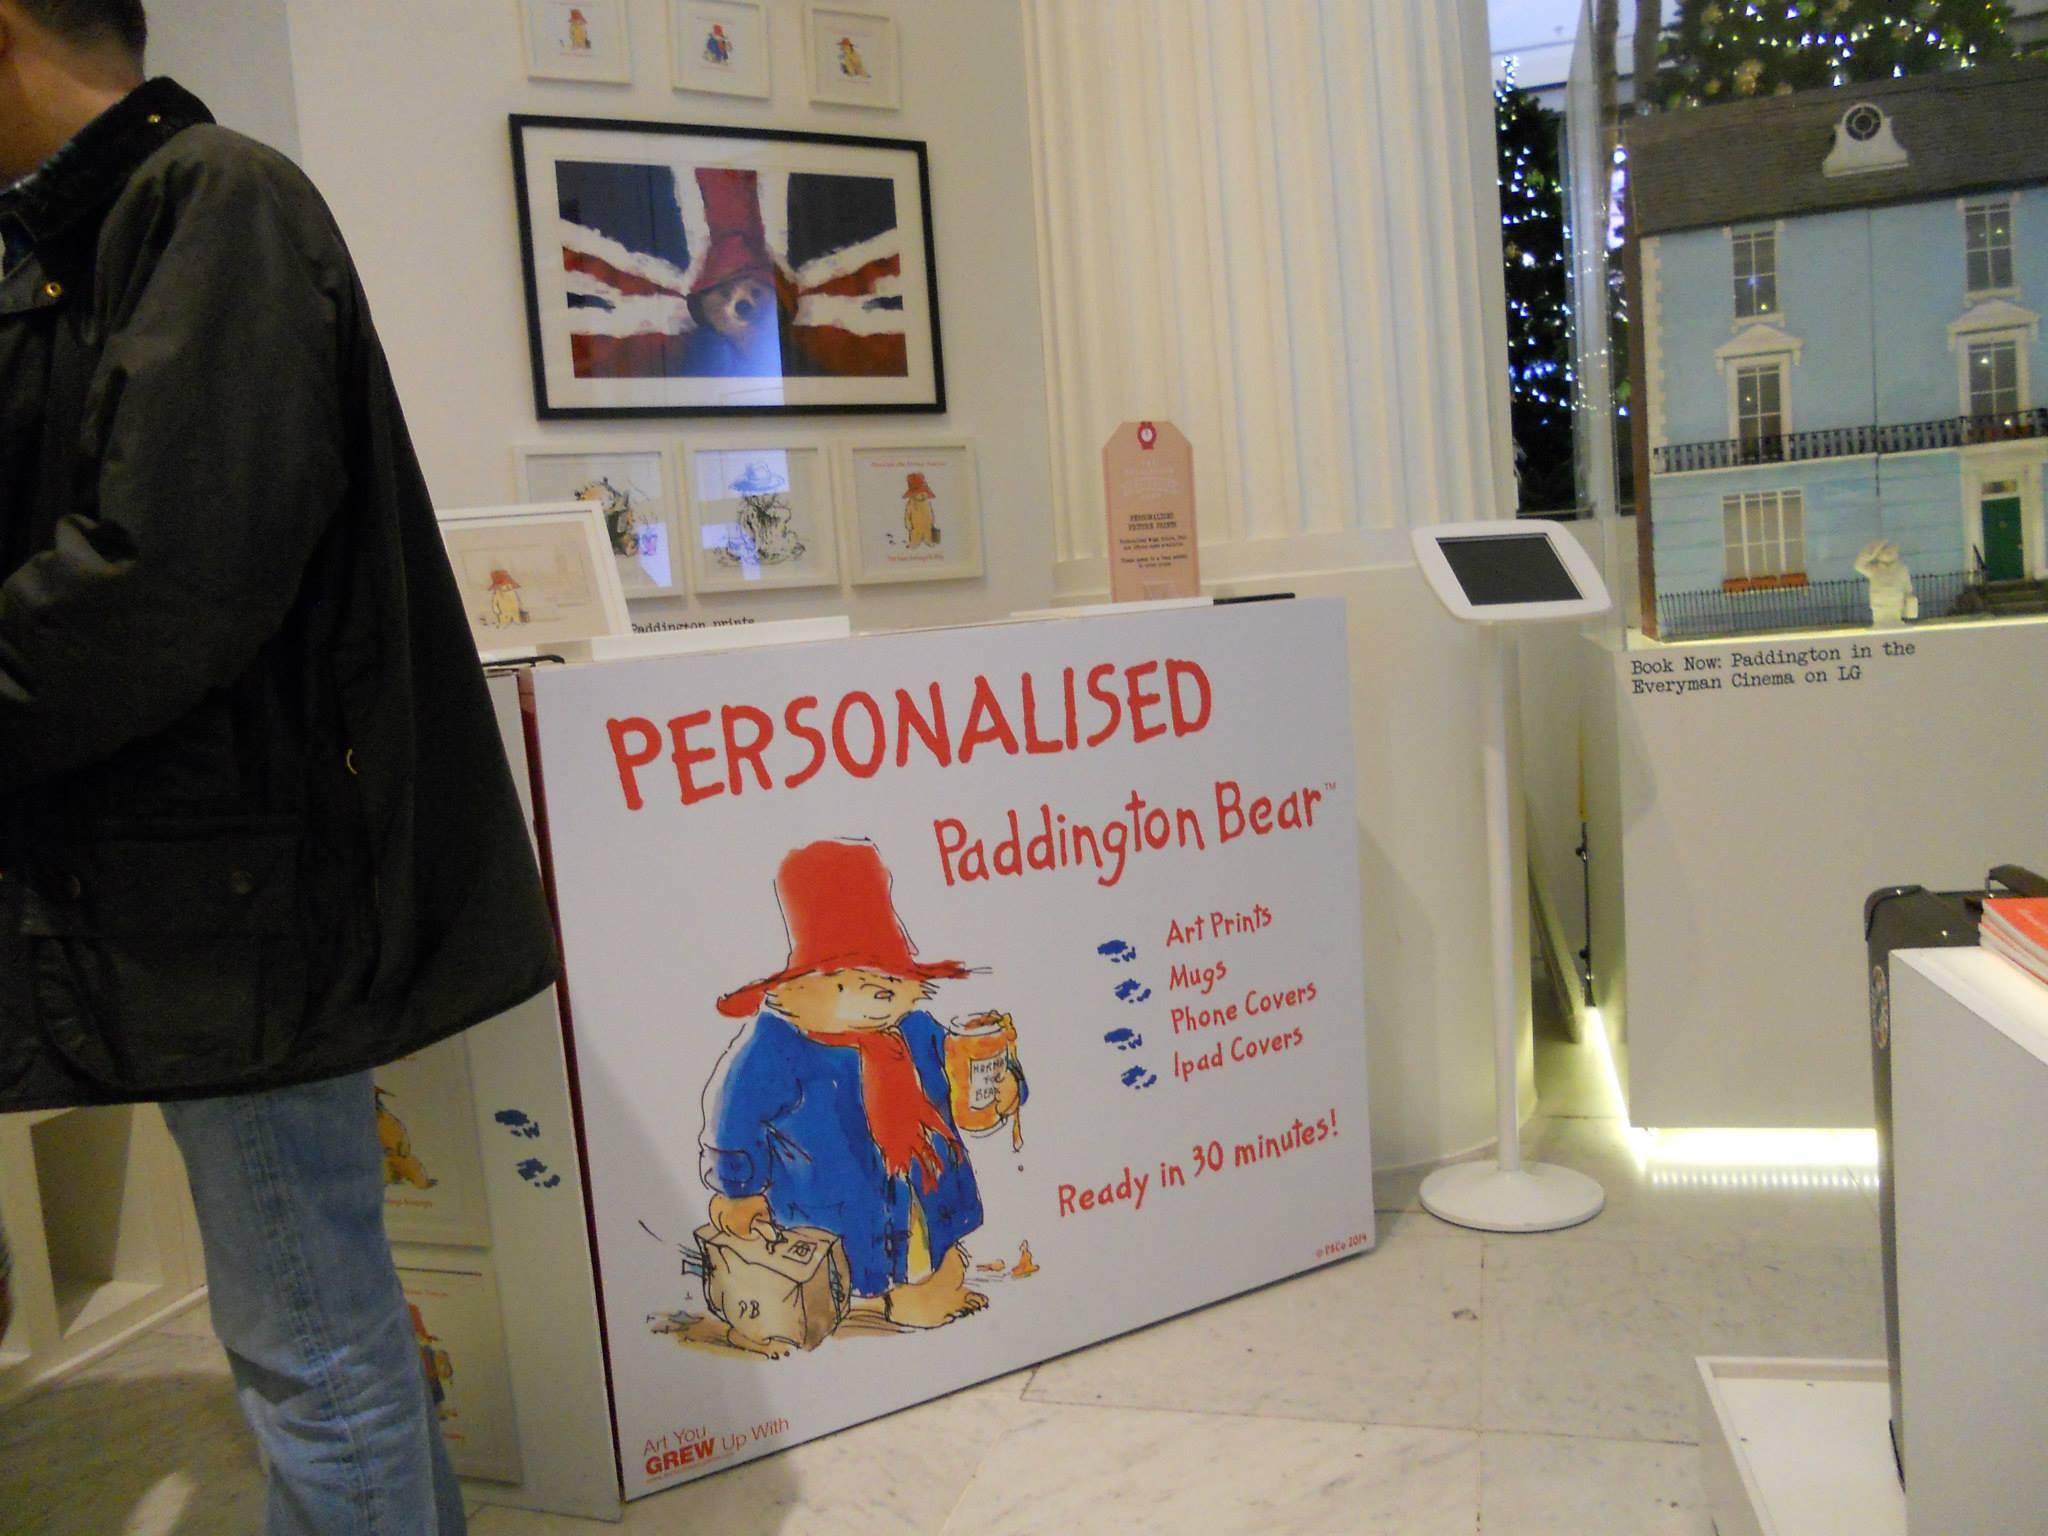 Paddington-Store-Selfridges-Personalised-Paddington